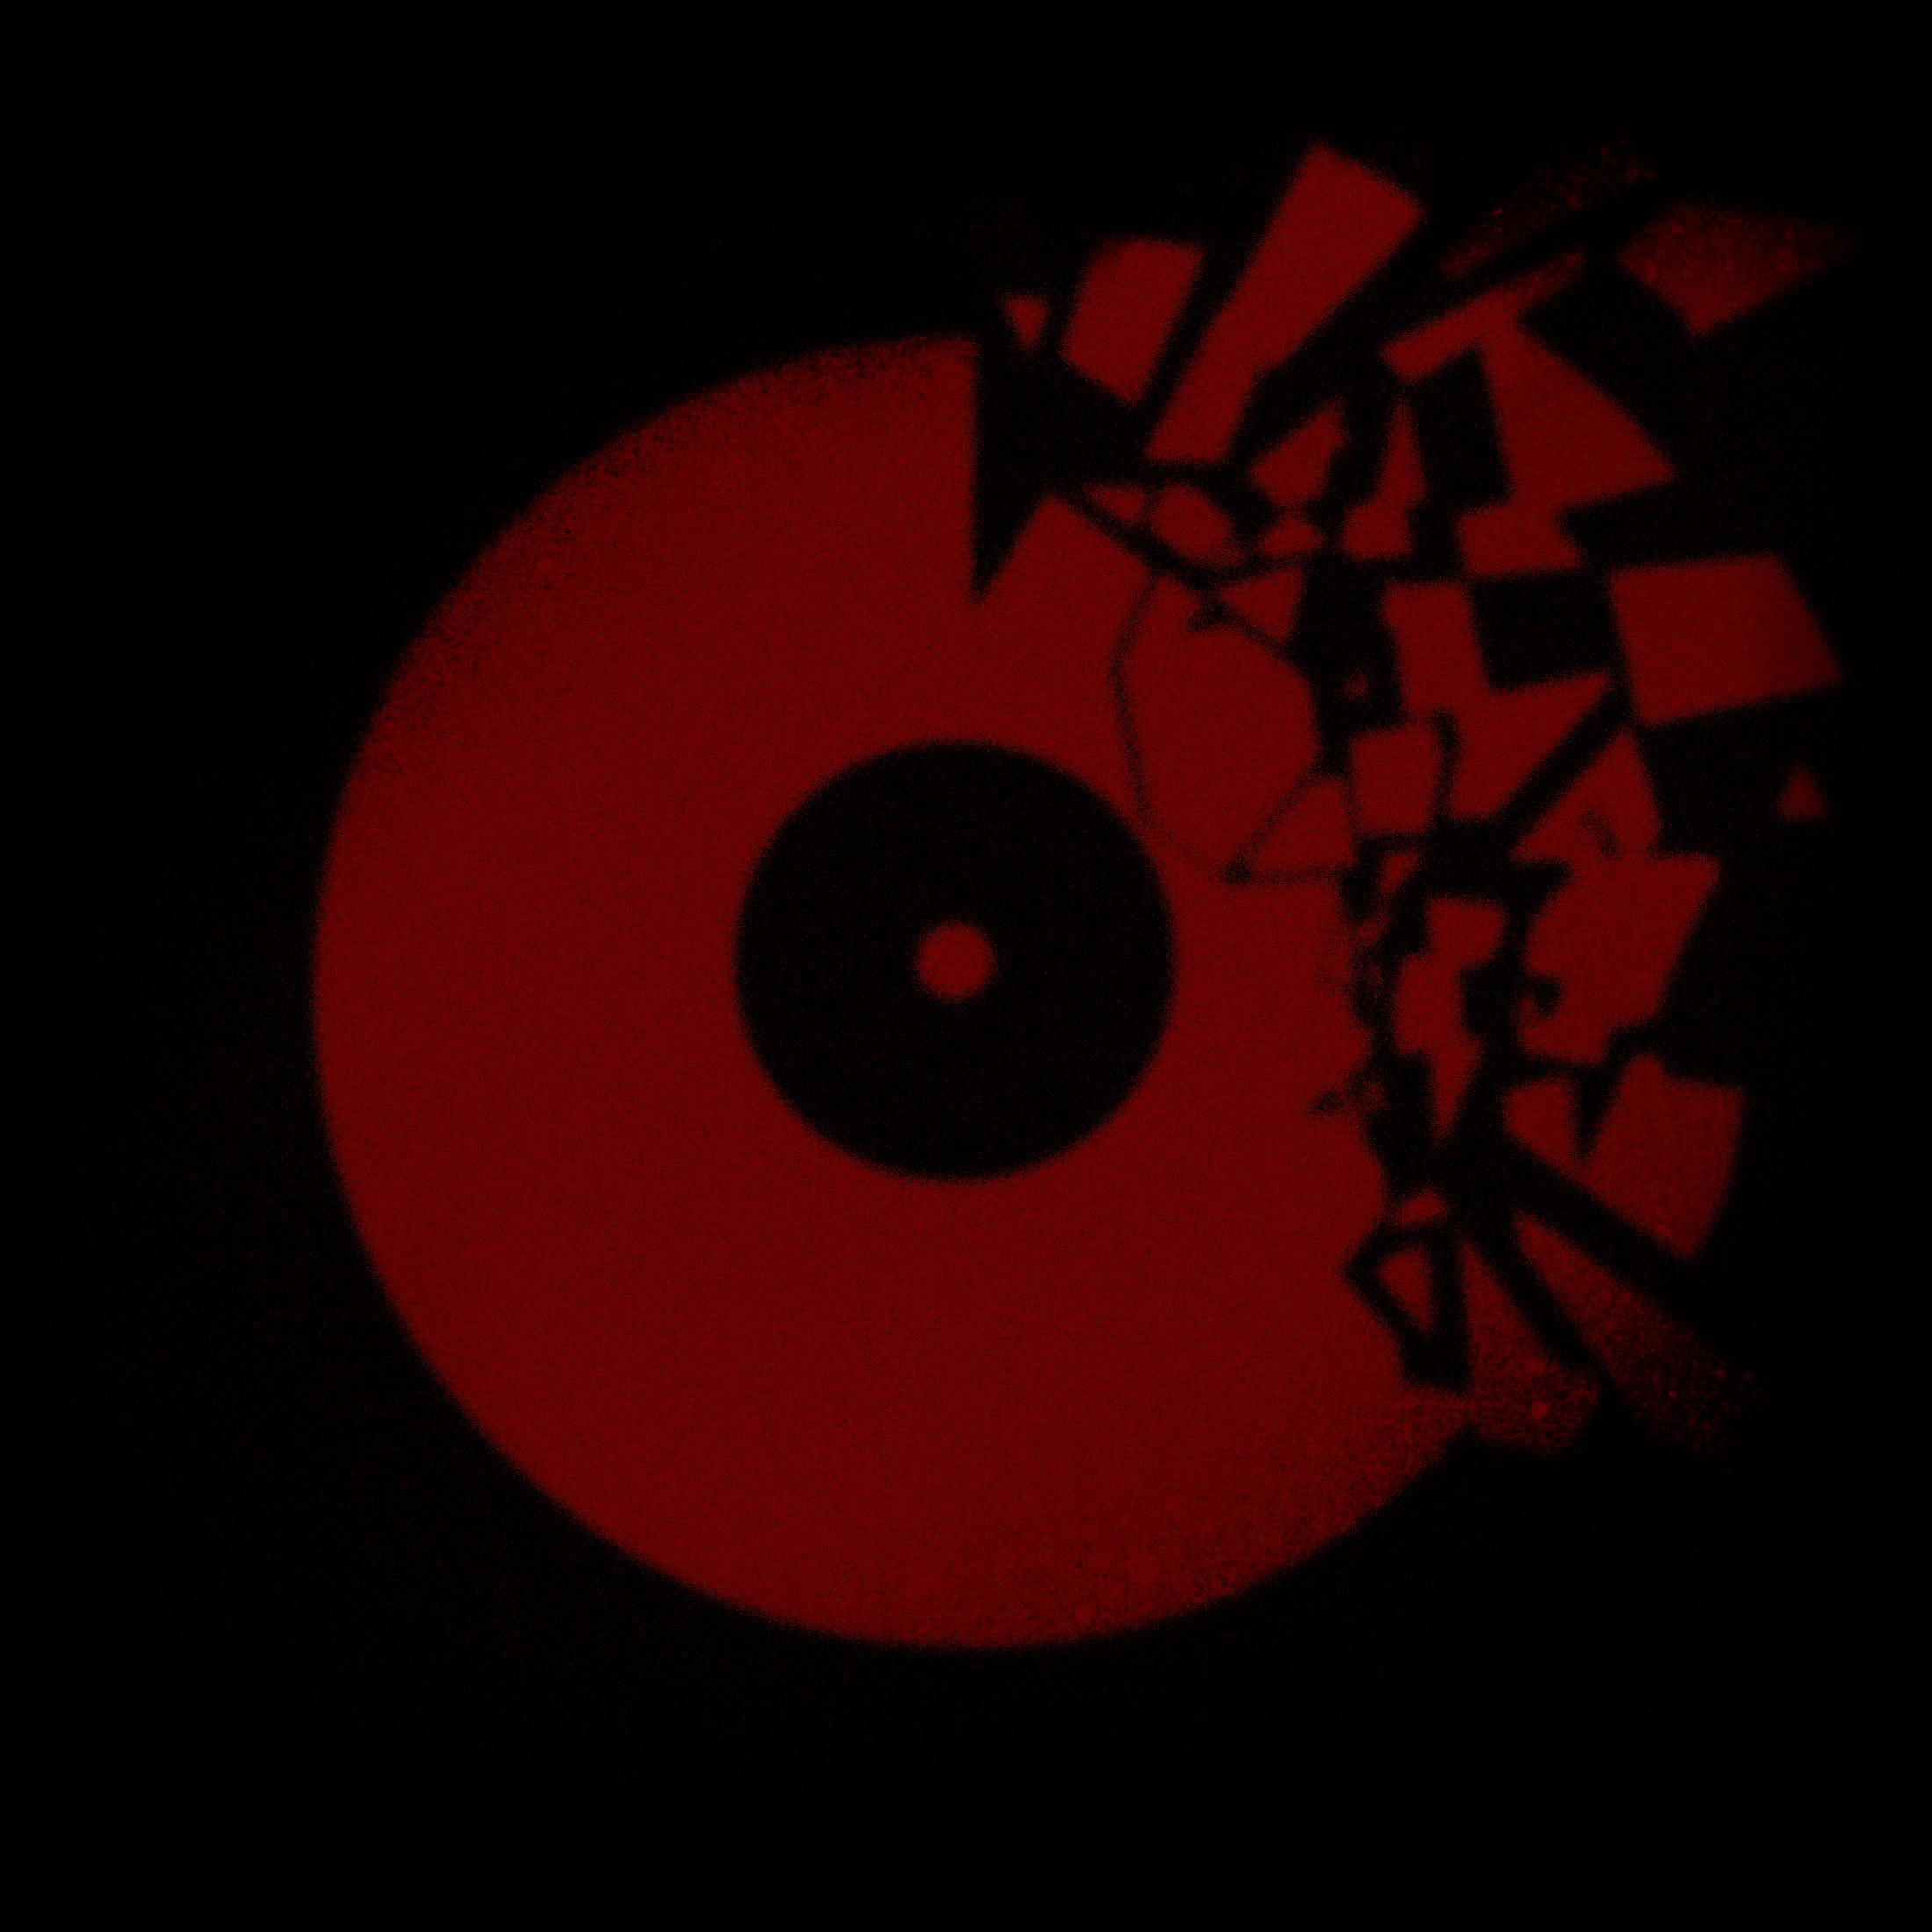 rebel_record.jpg